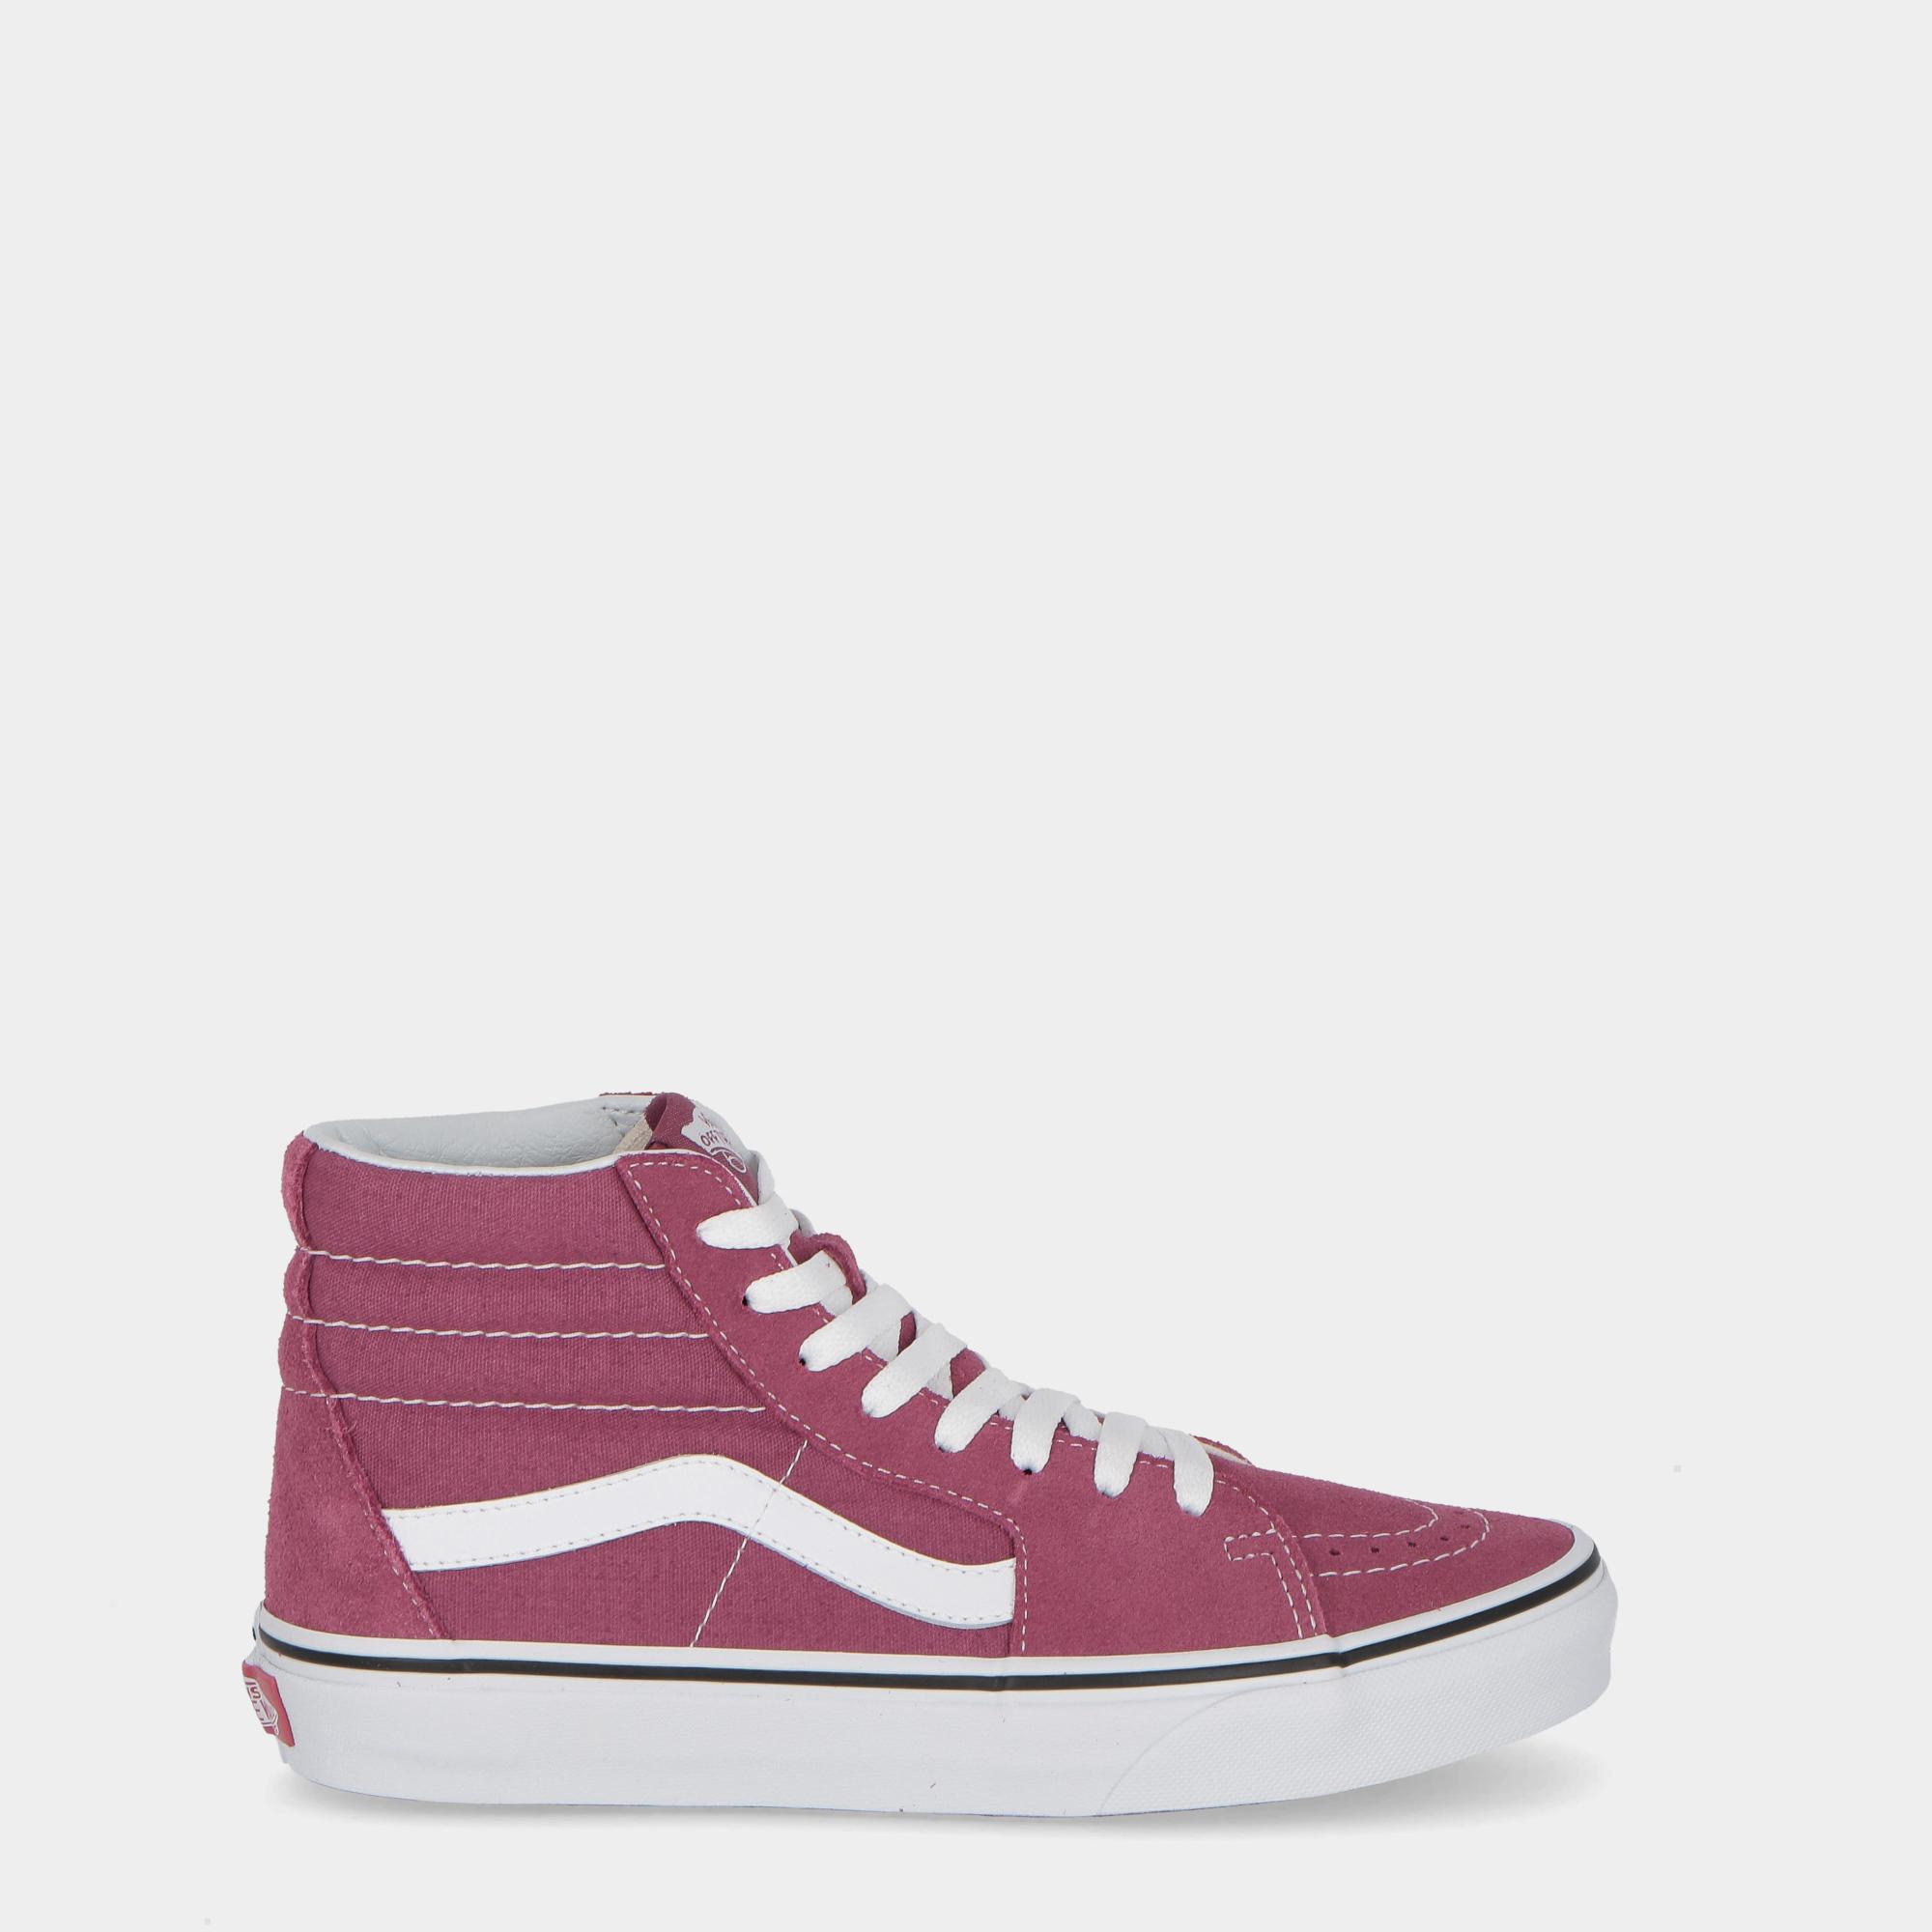 981163cc2ce2 Vans Color Theory Sk8-hi Dry Rose